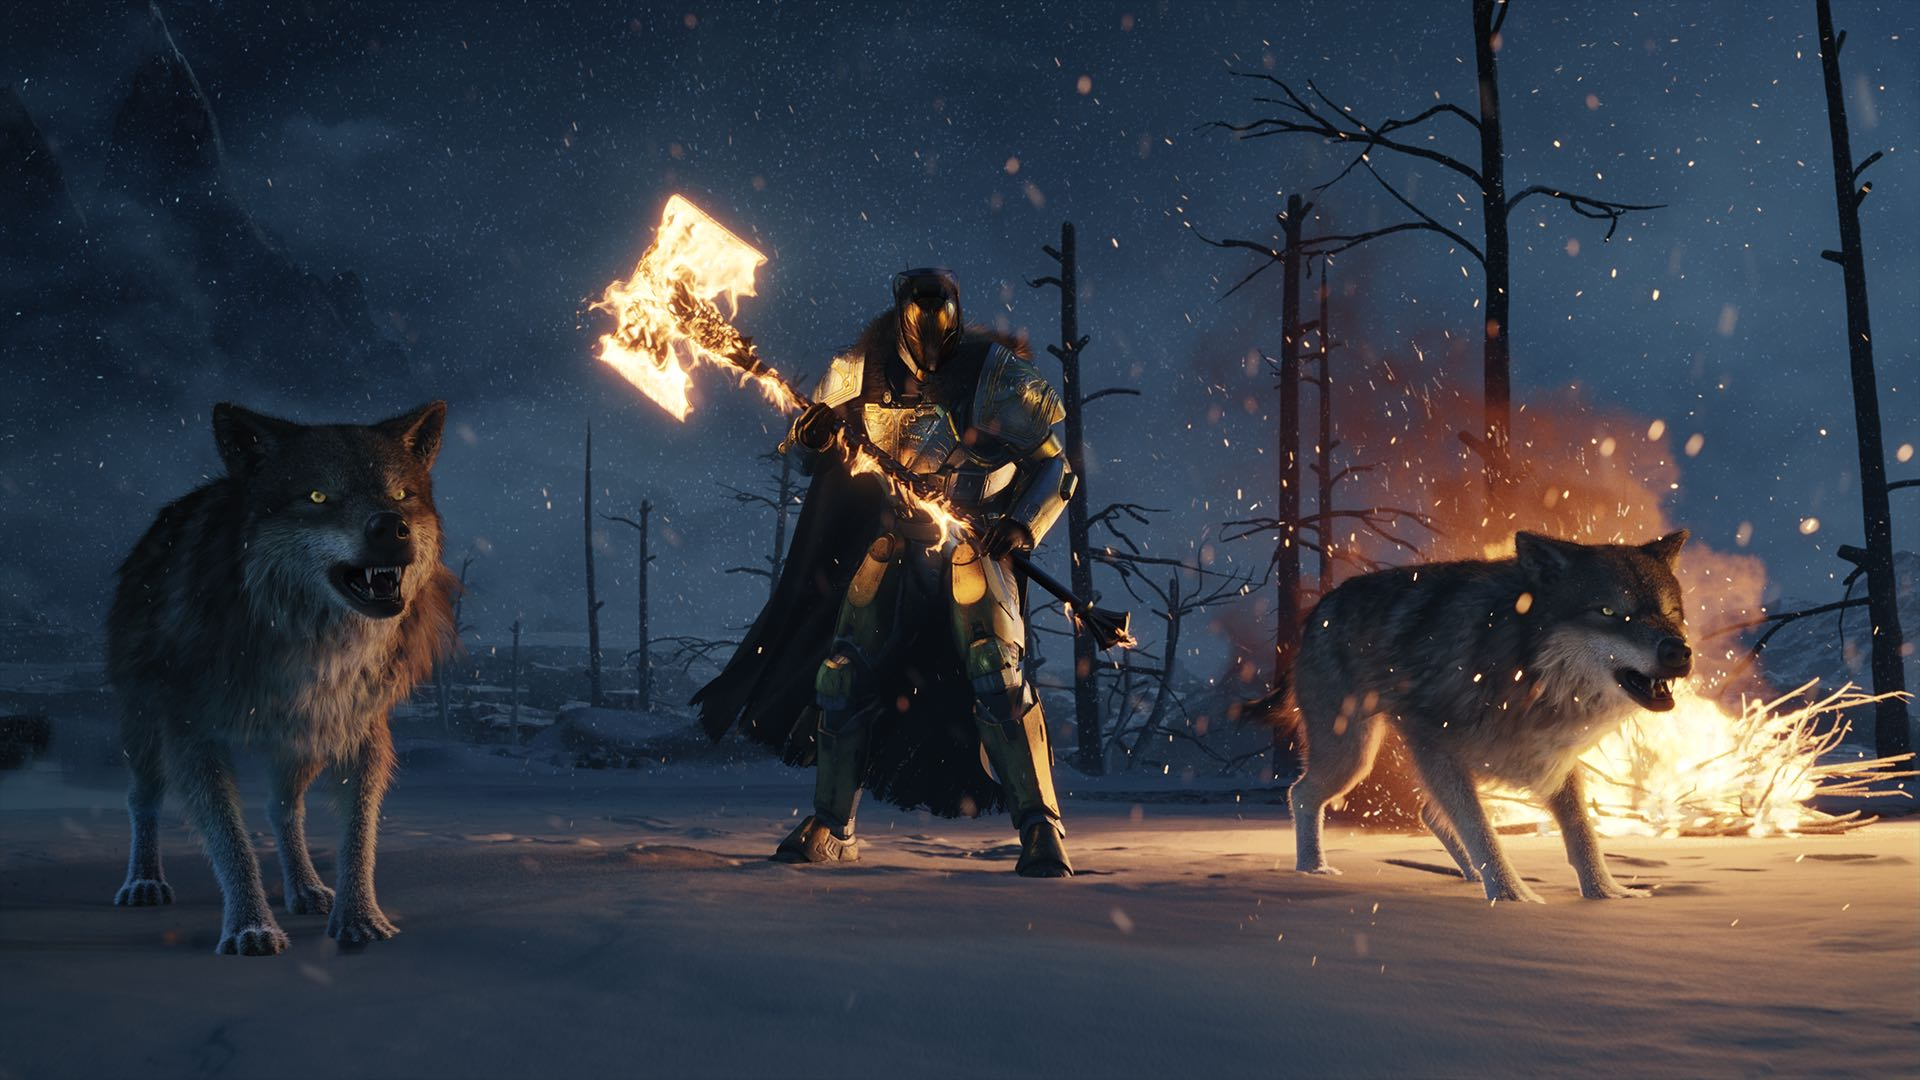 Destiny 2 guide: Iron Banner: Season 9 quest